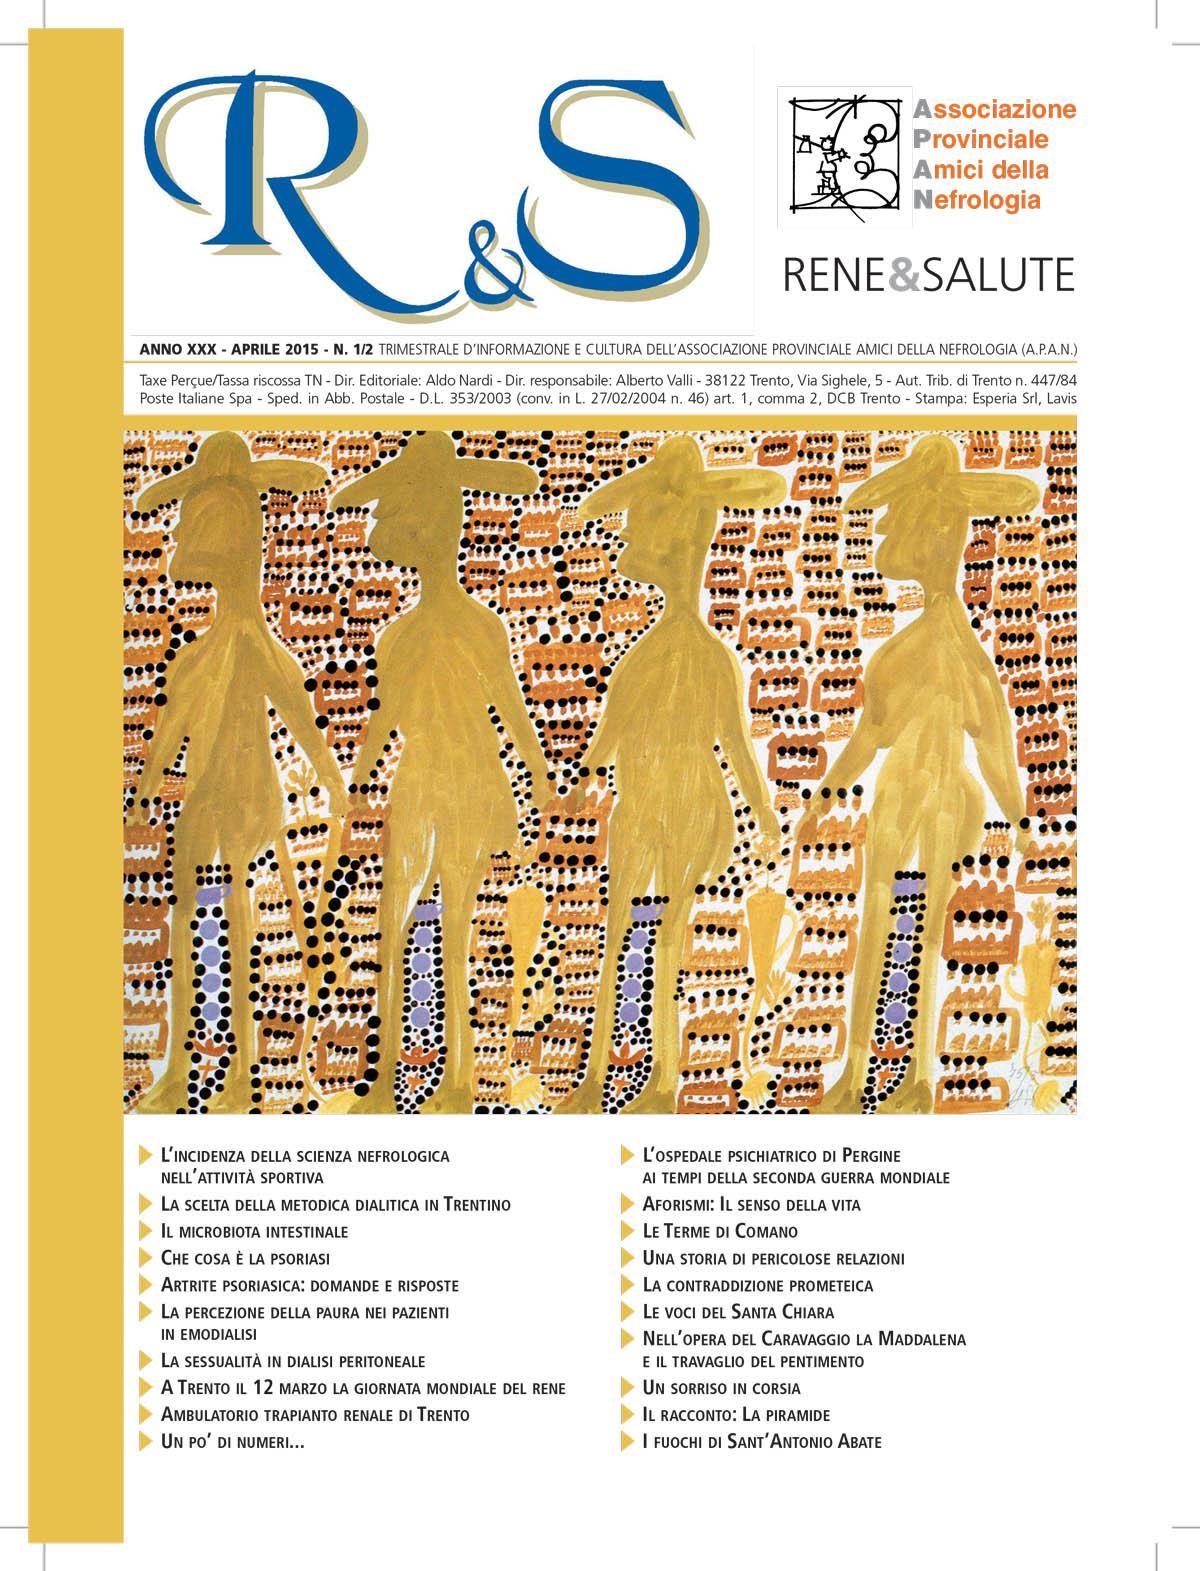 Rene & Salute 2015.1-2